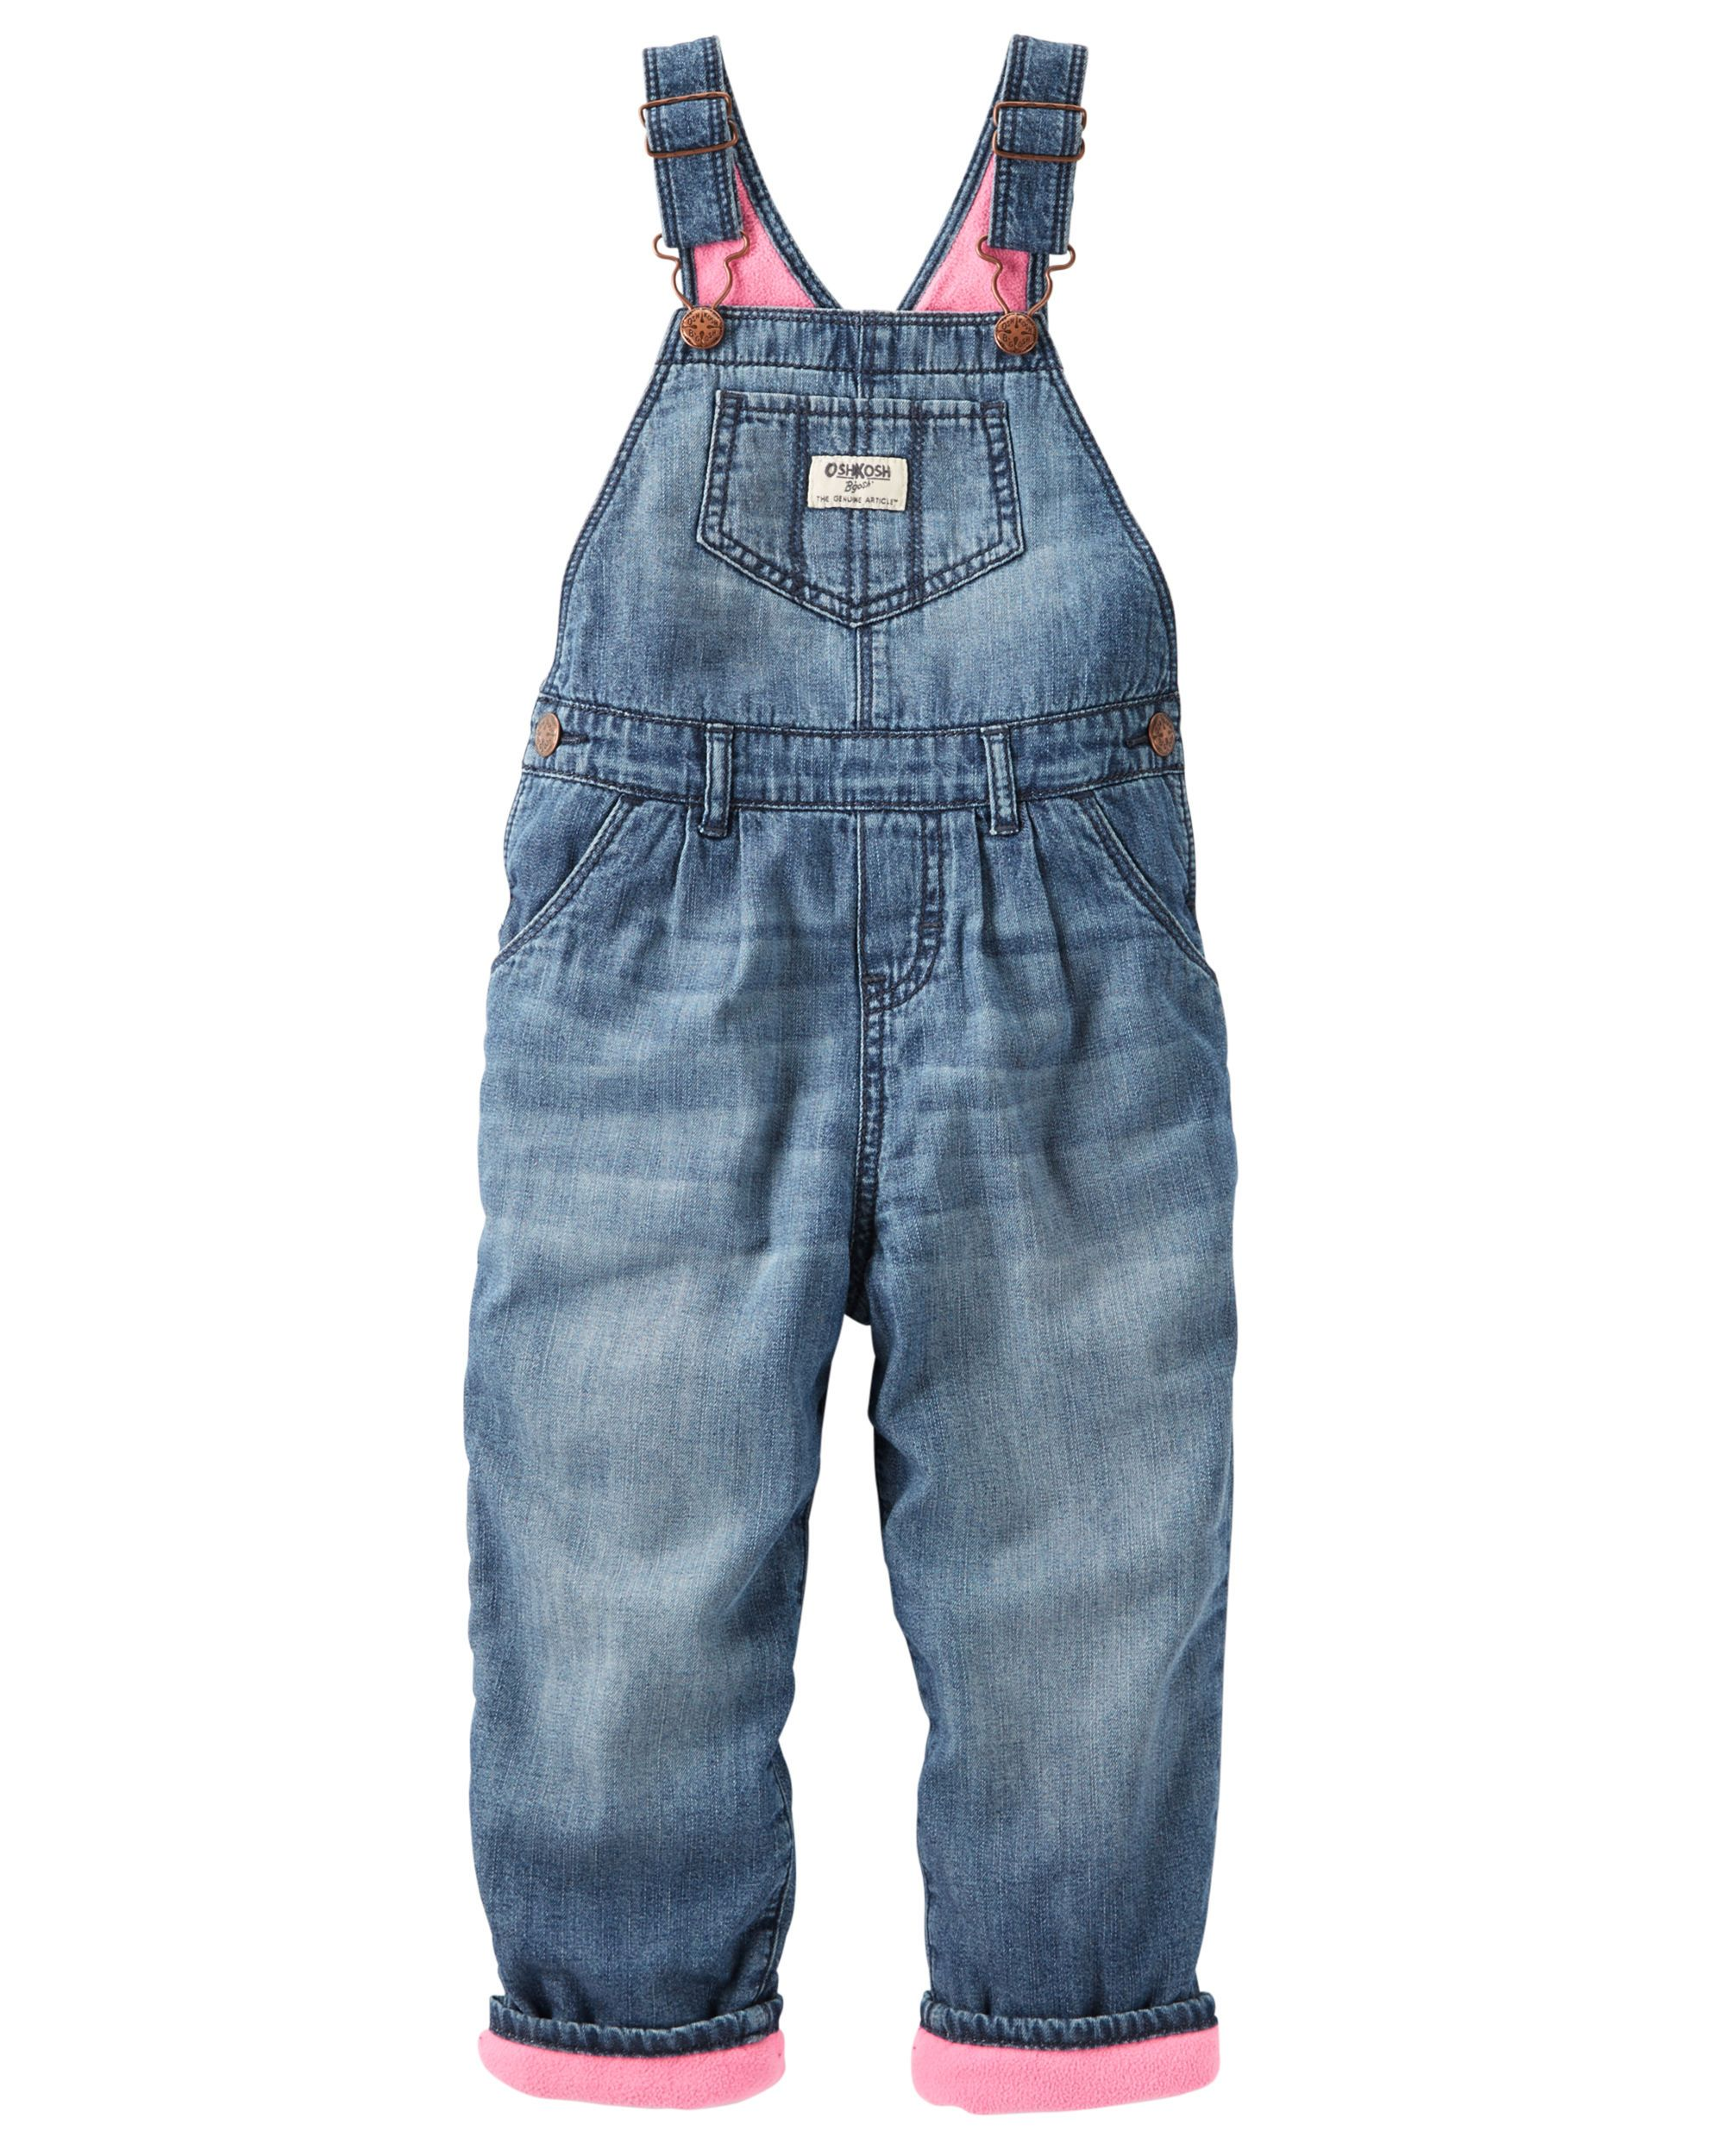 781596c94 Baby Girl Fleece-Lined Denim Overalls - Ribbon Blue from OshKosh B ...